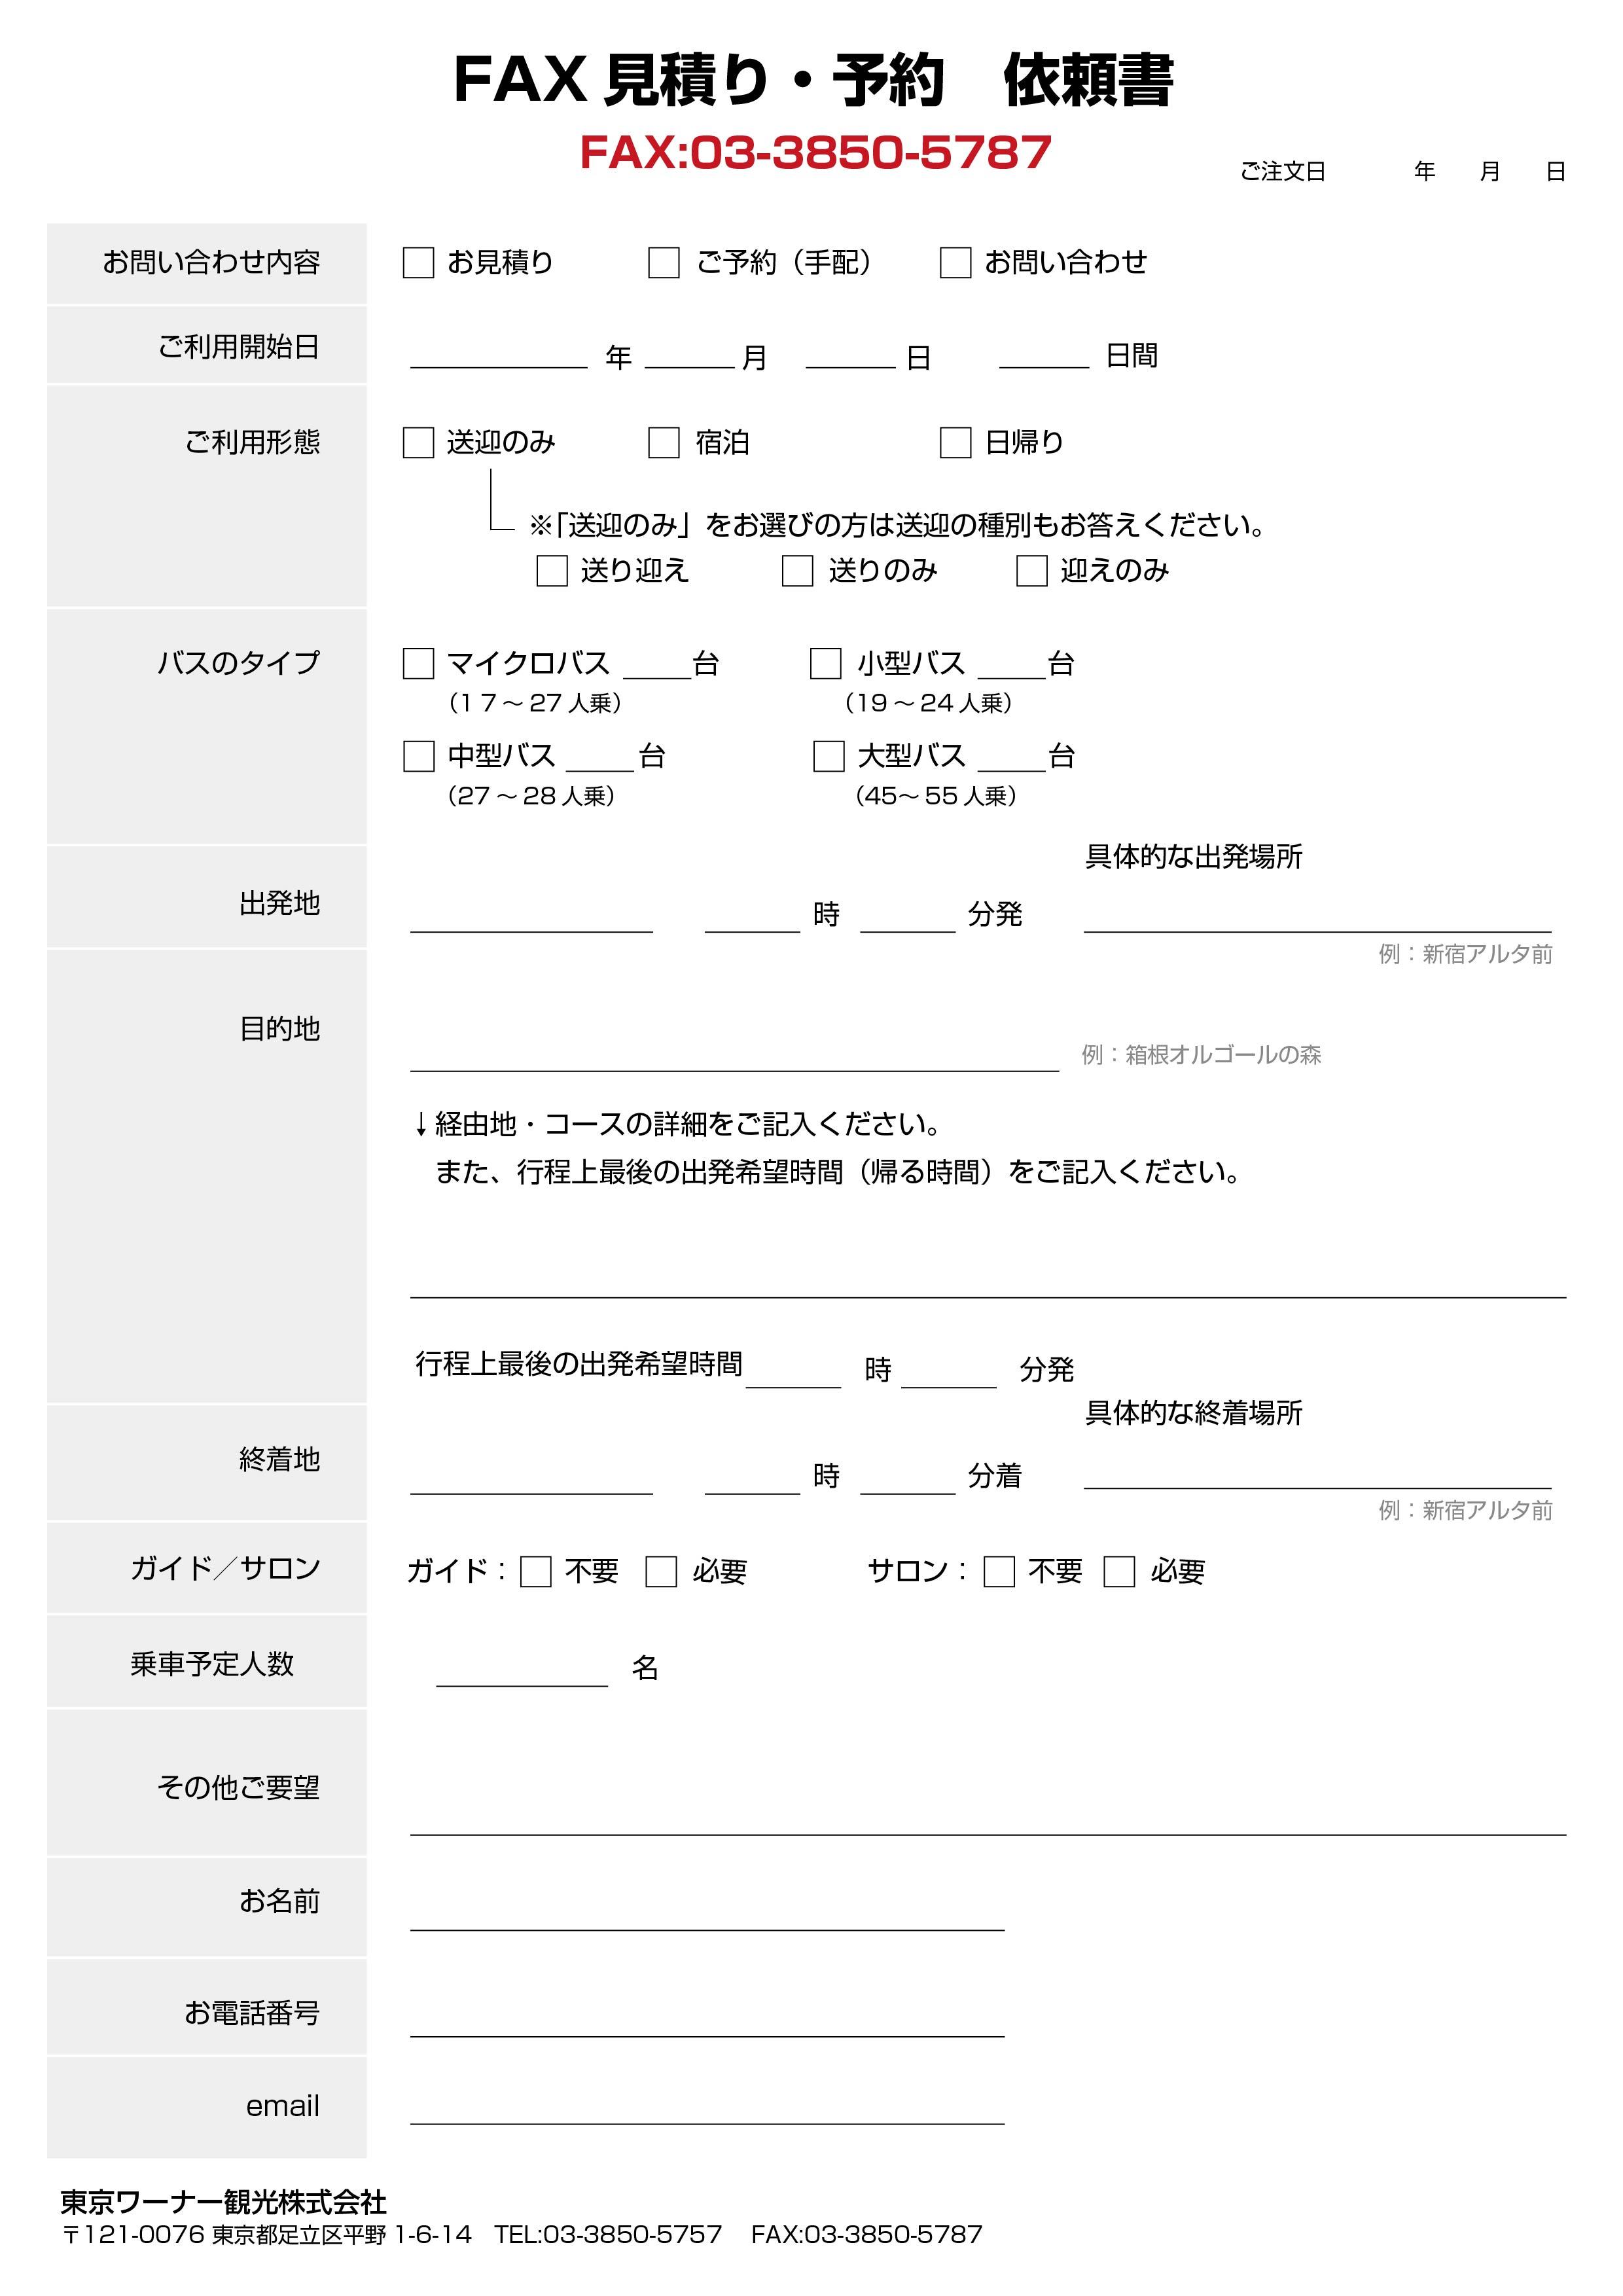 fax見積り 予約用紙 貸切バス 送迎バスのことなら 東京ワーナー観光